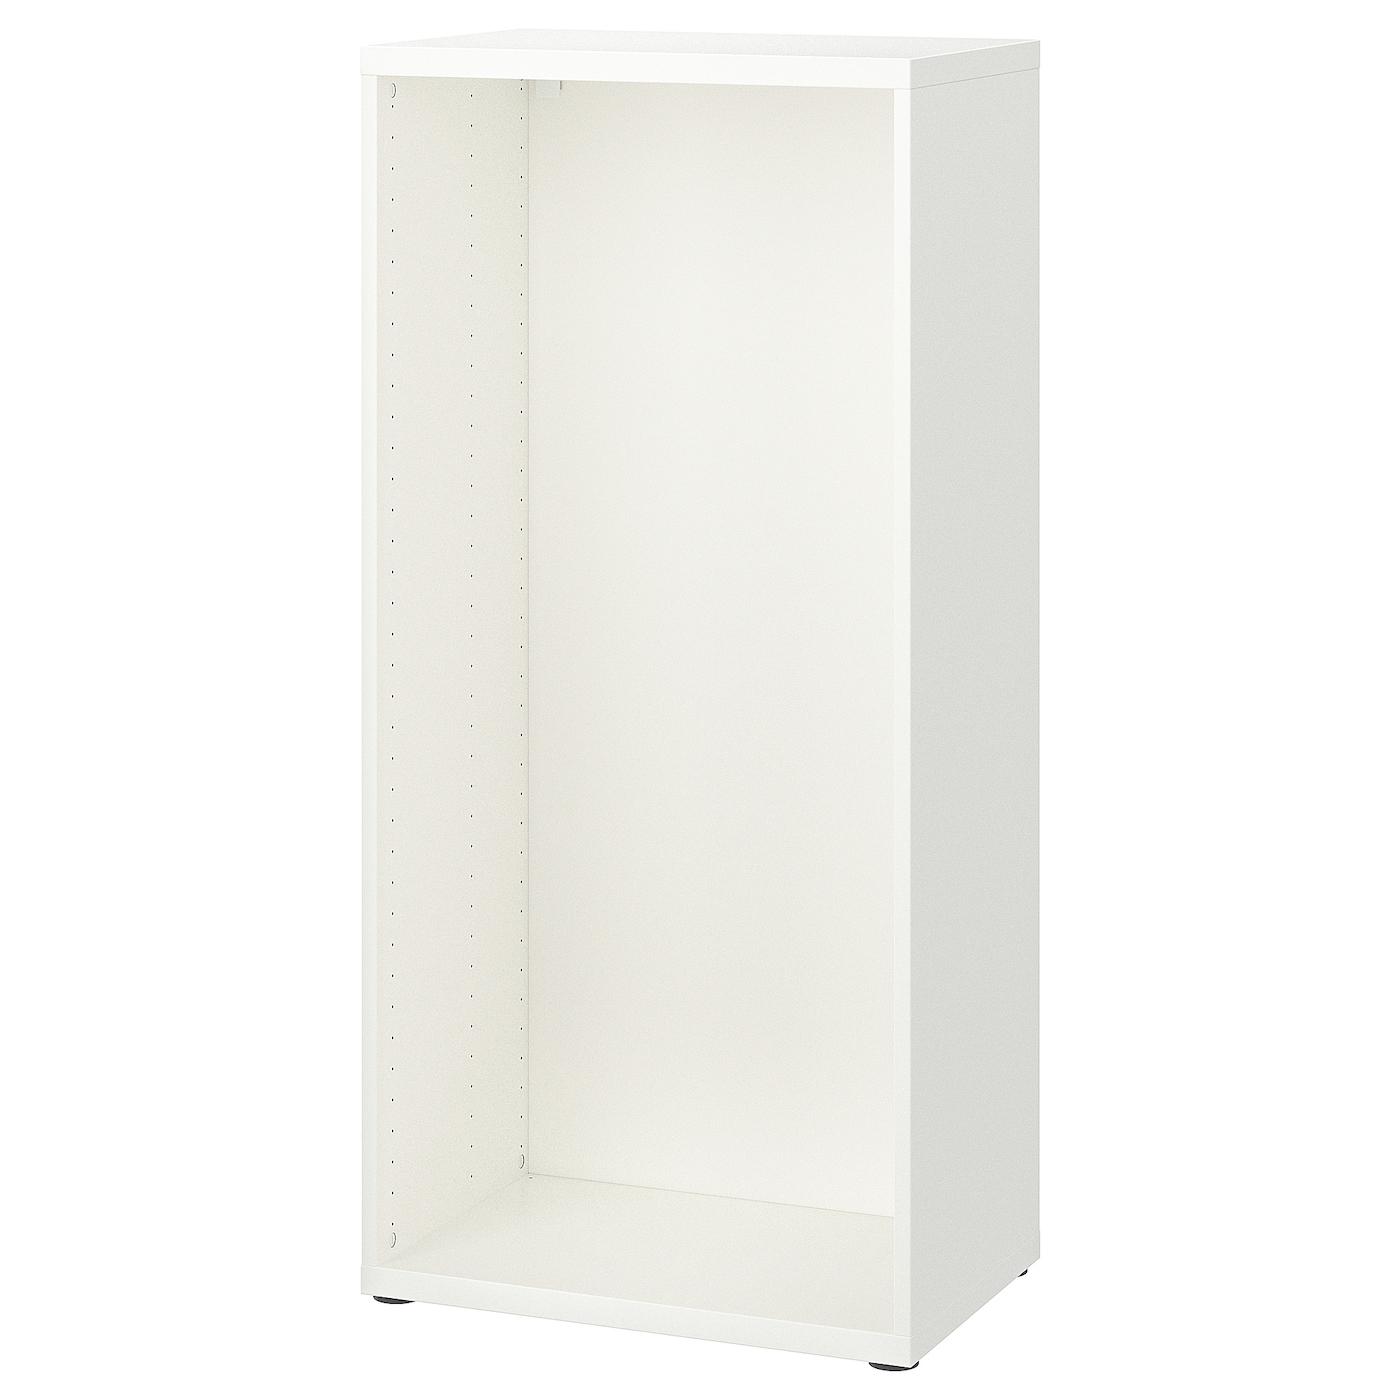 Meuble Ikea Besta Blanc bestÅ structure - blanc 60x40x128 cm